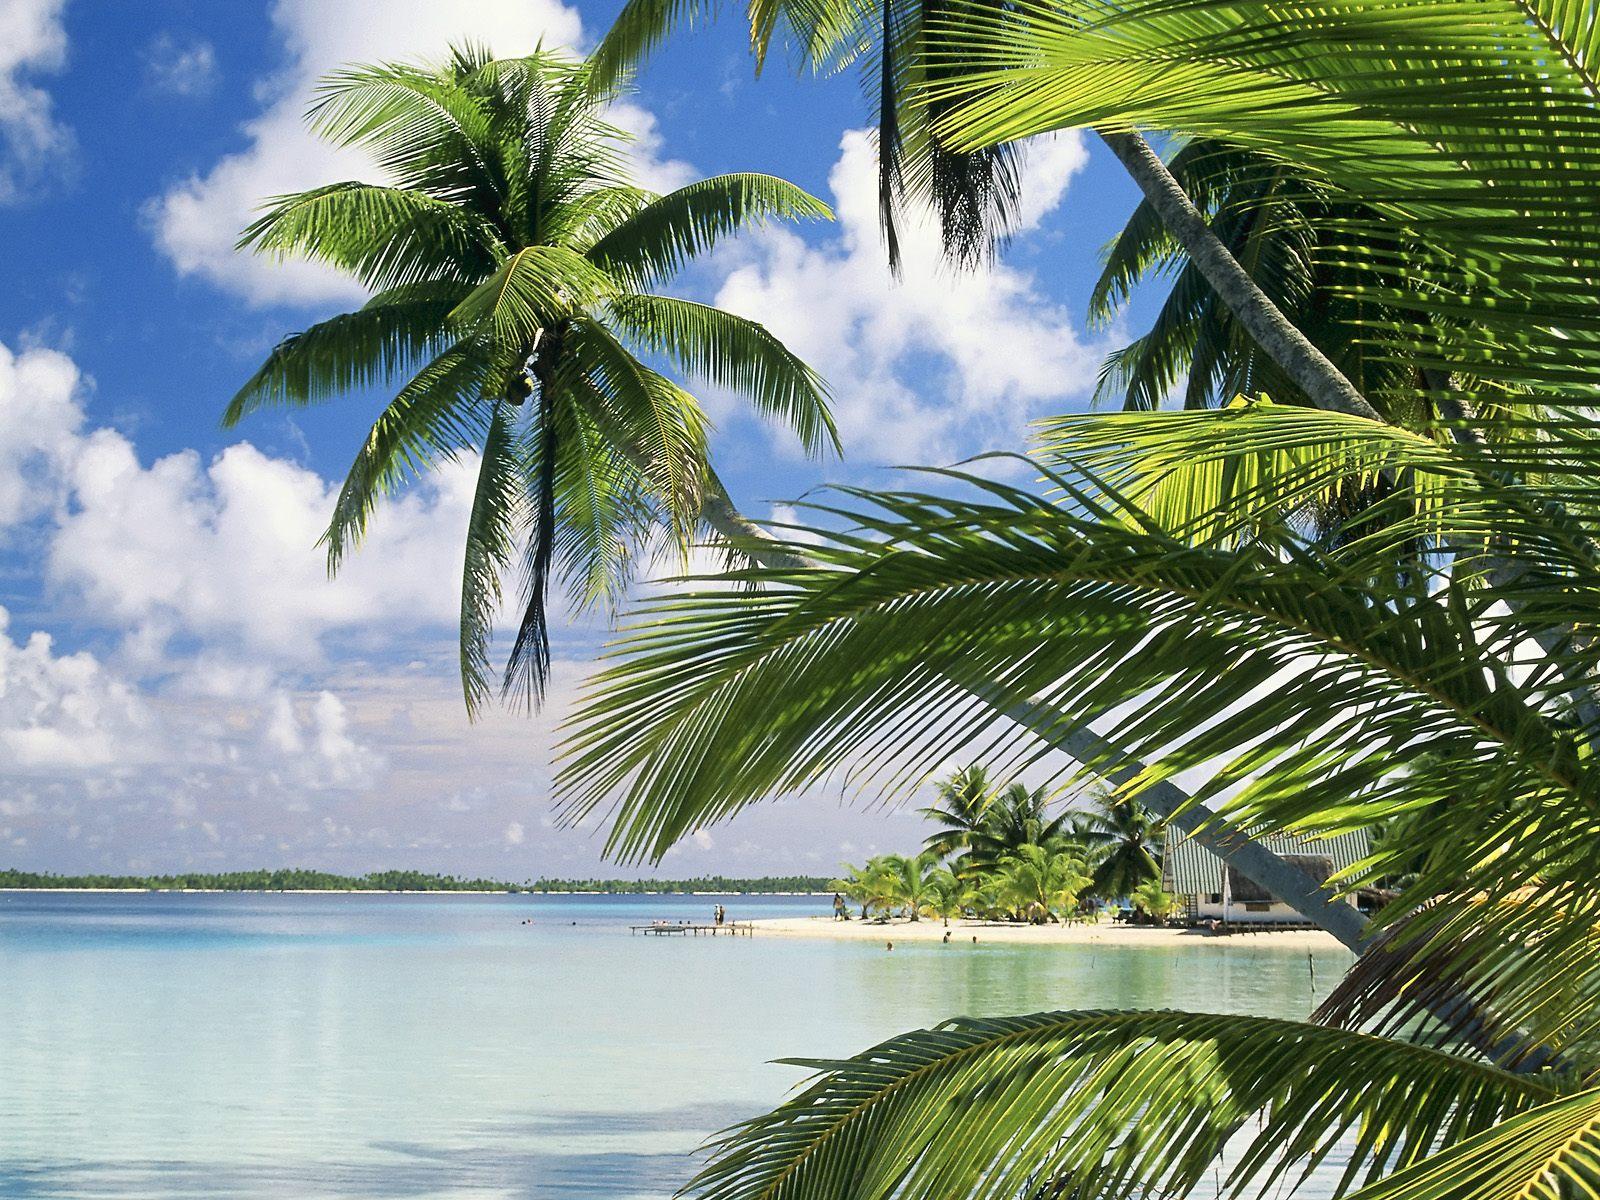 Florida beach 1600x1200 1600x1200